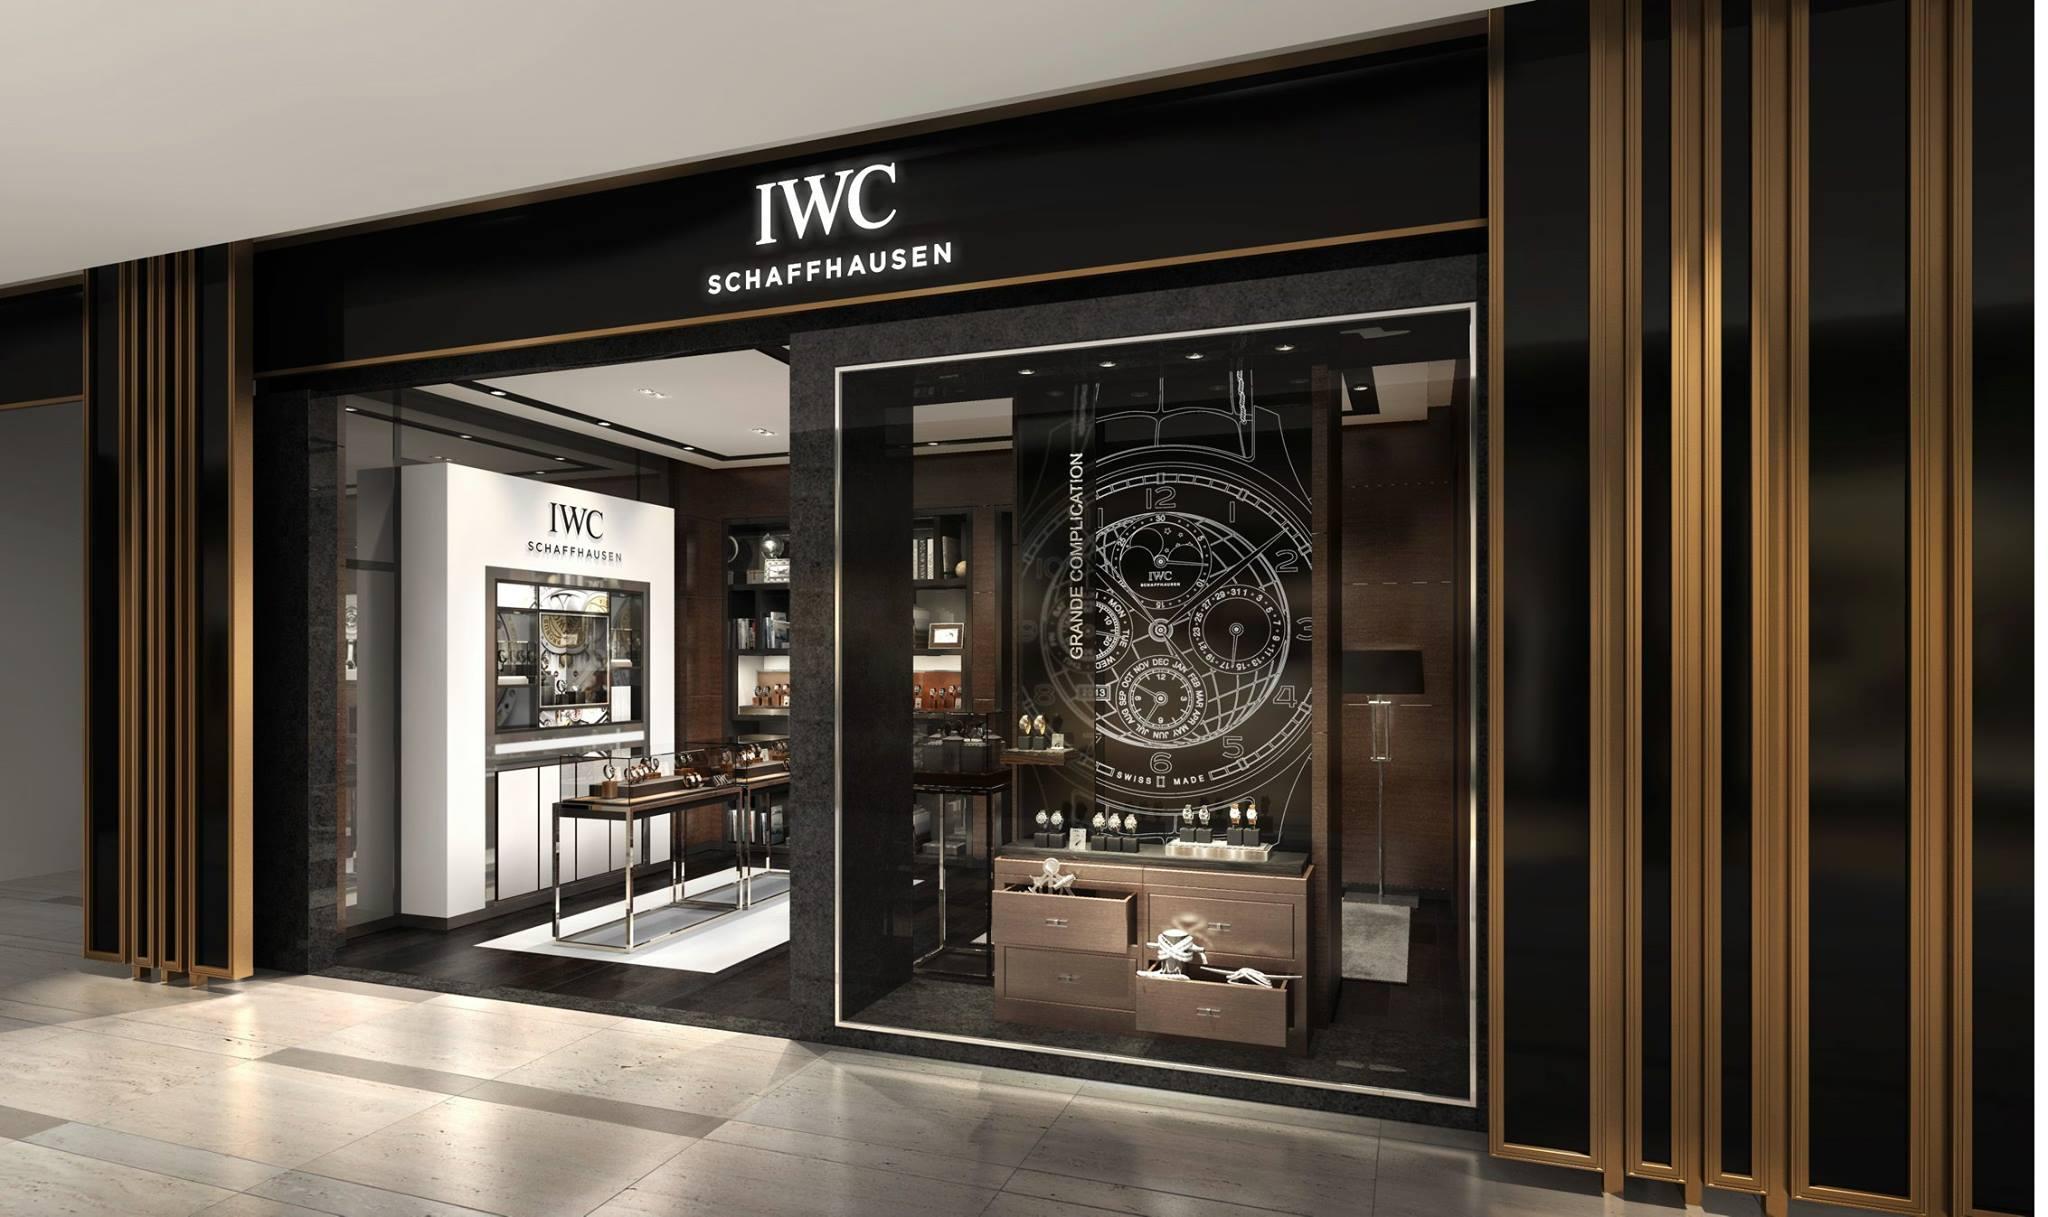 Naziv: IWC-London-Regent-Street-1.jpg, pregleda: 441, veličina: 241,1 KB